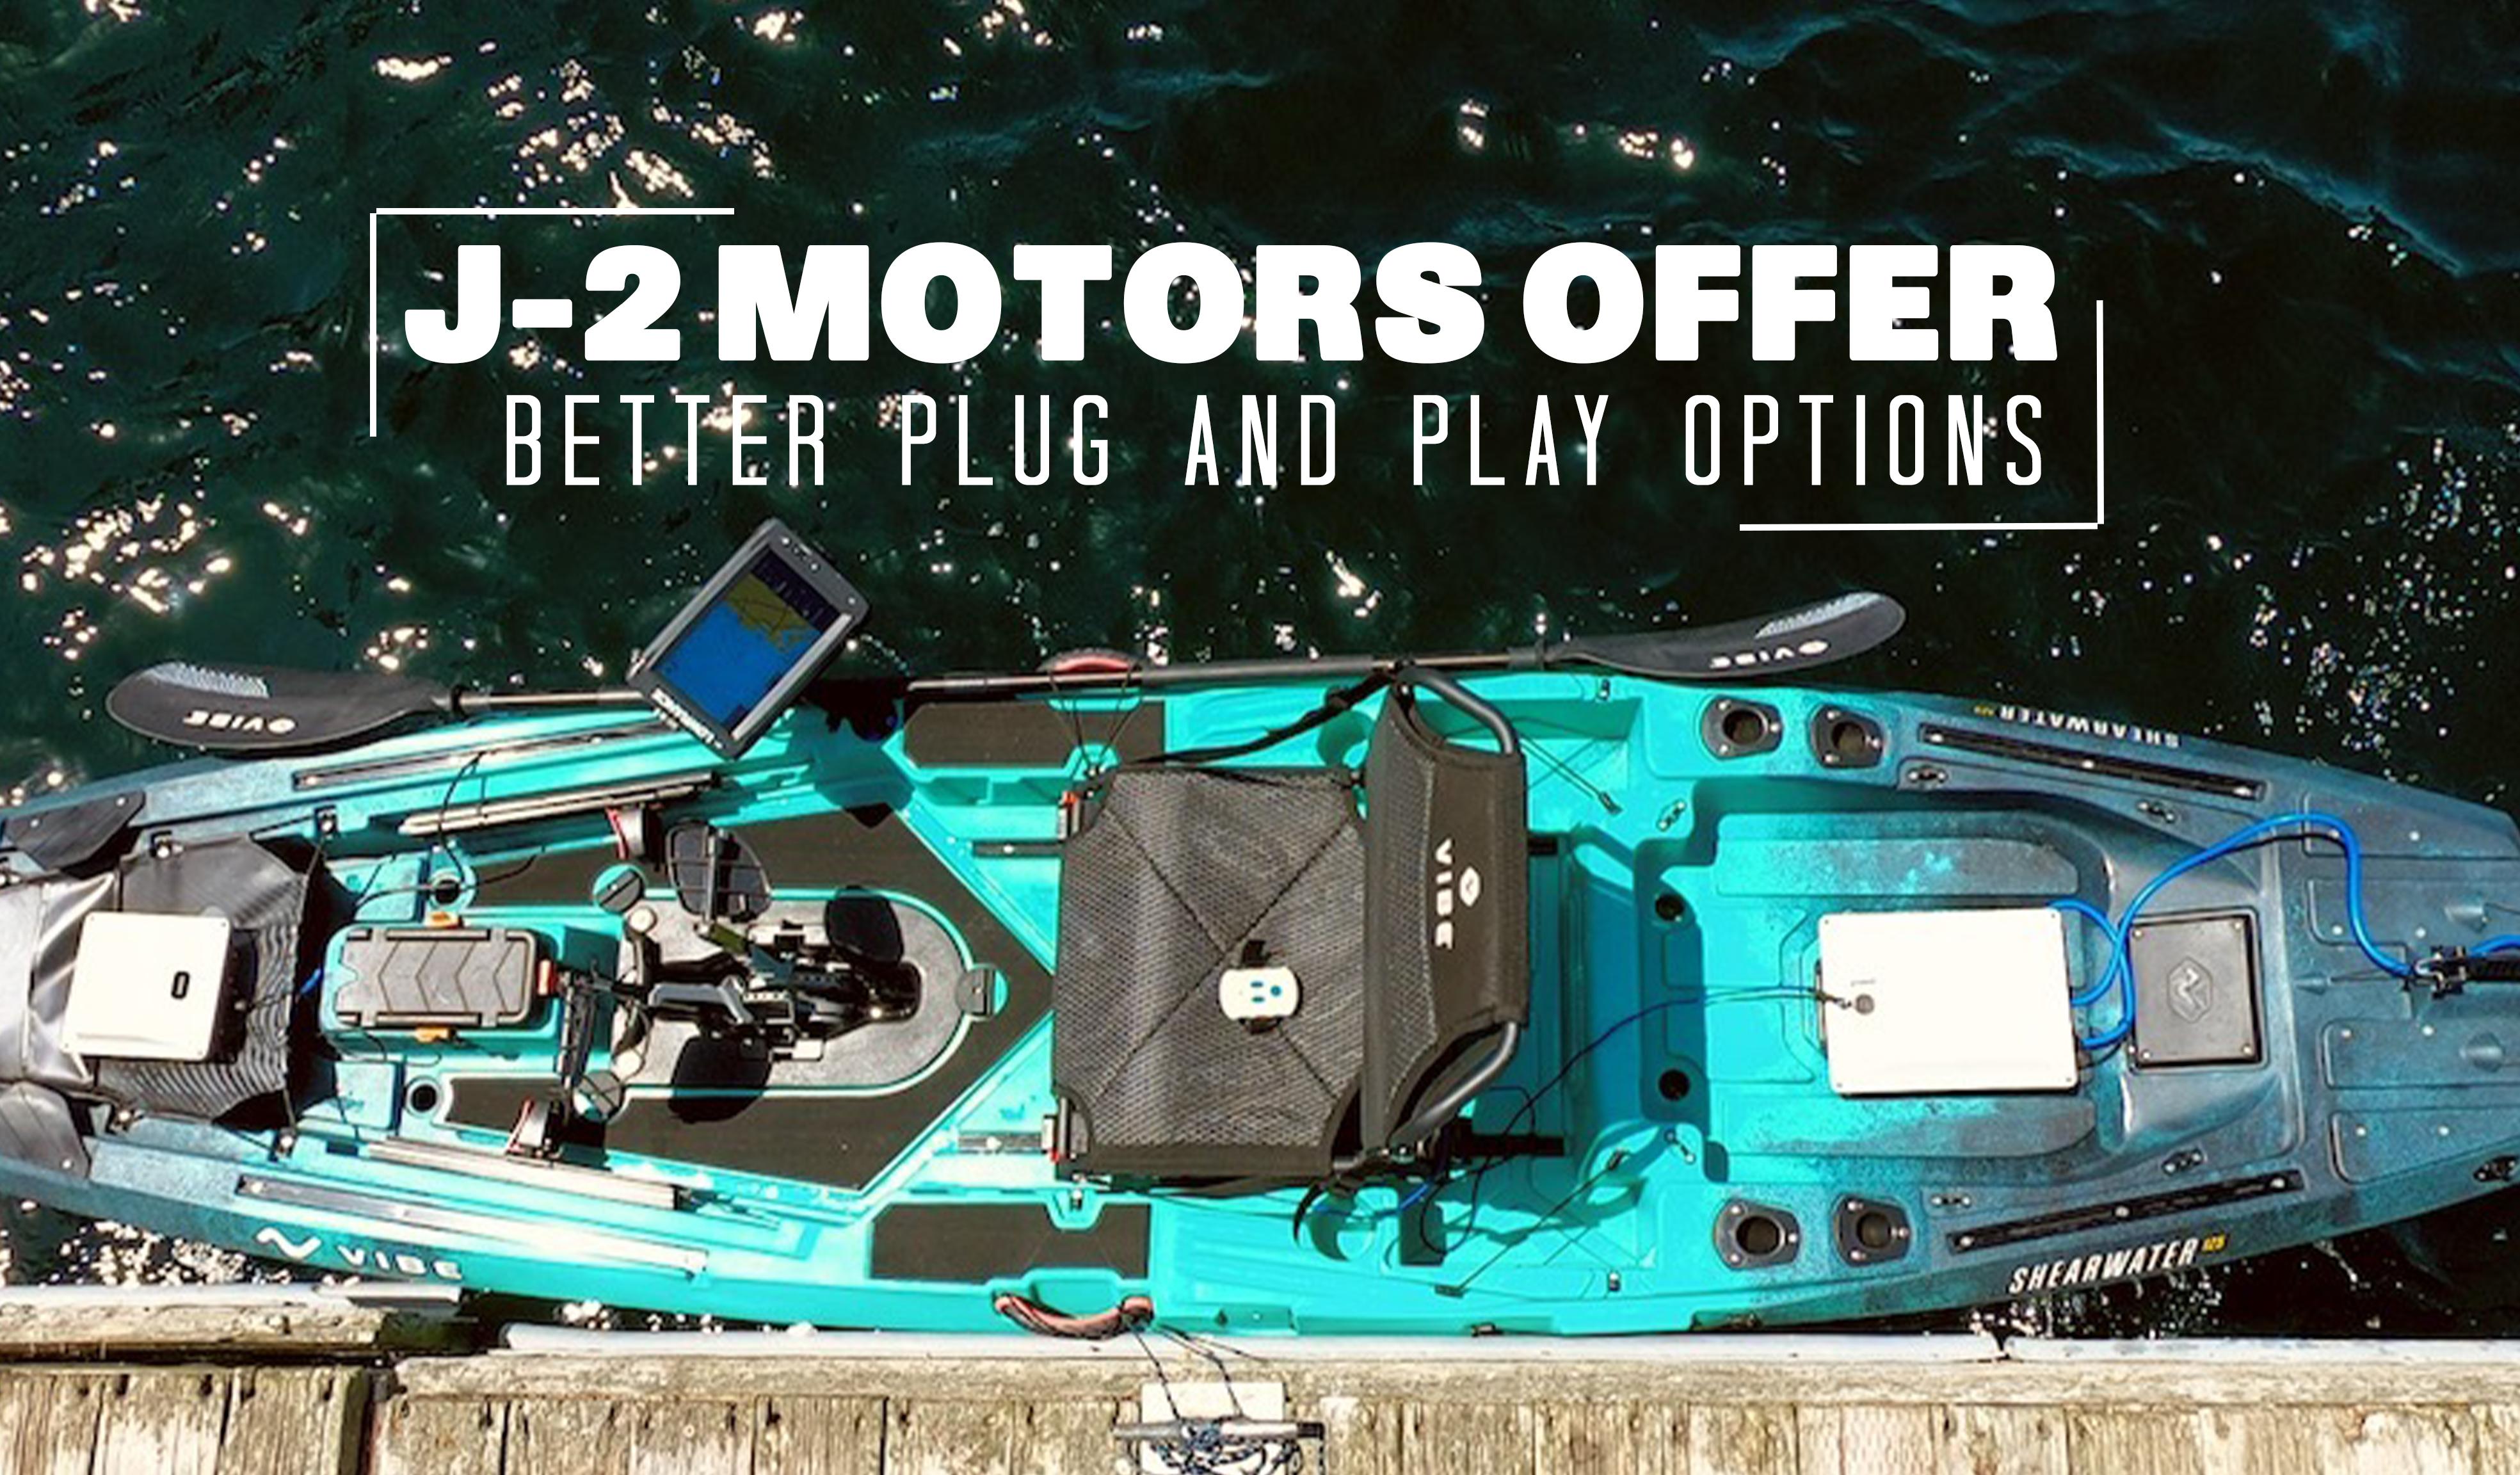 J-2 Motors Offer Better Plug & Play Options